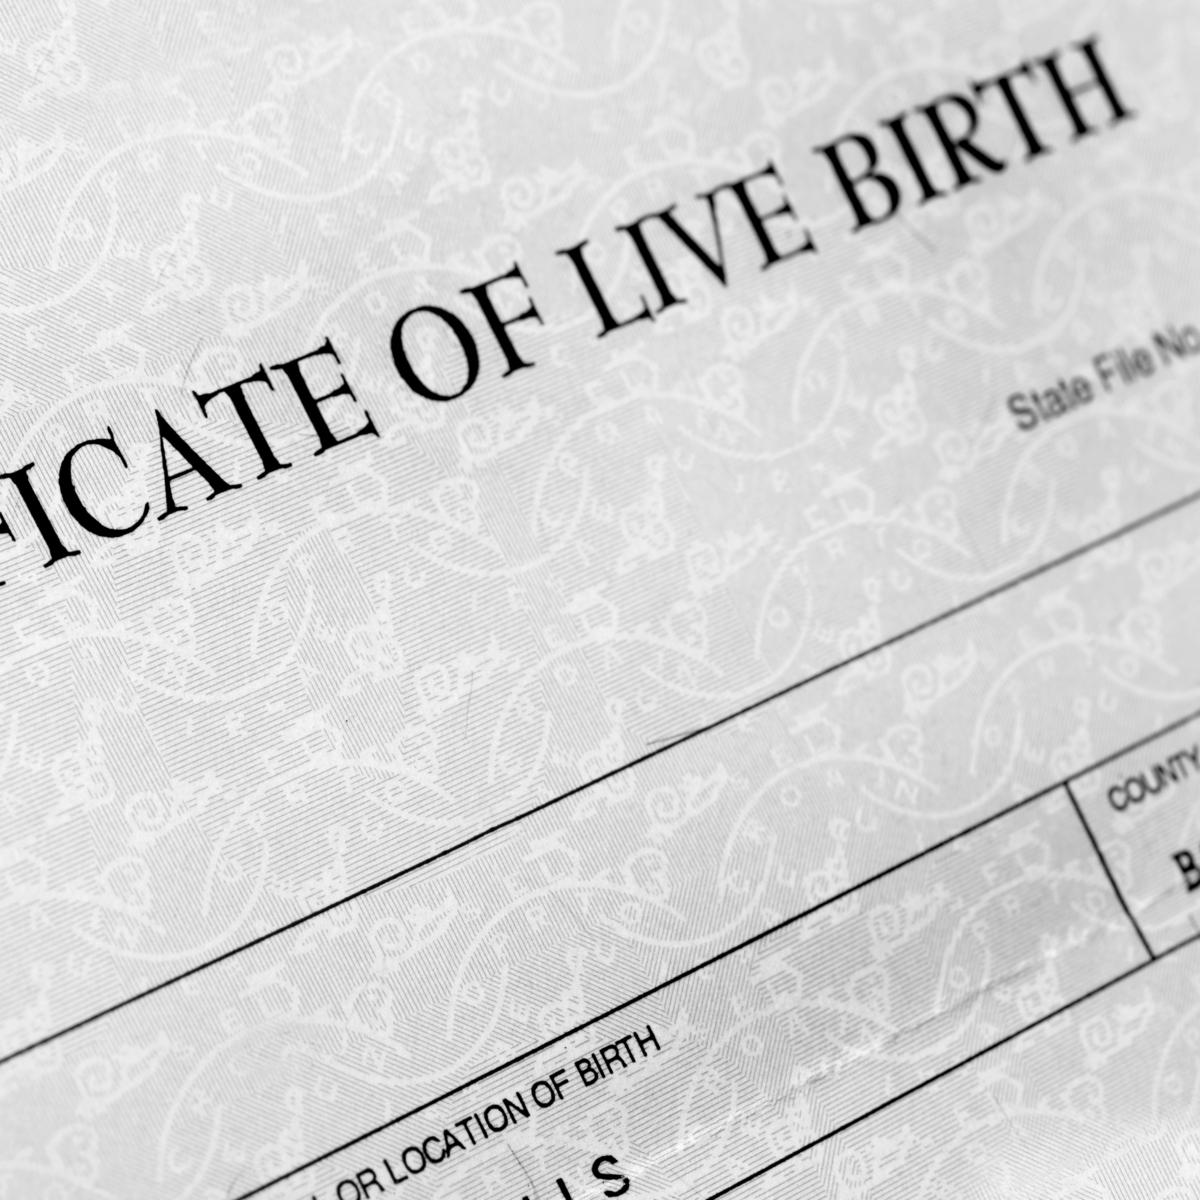 michigan city indiana birth records